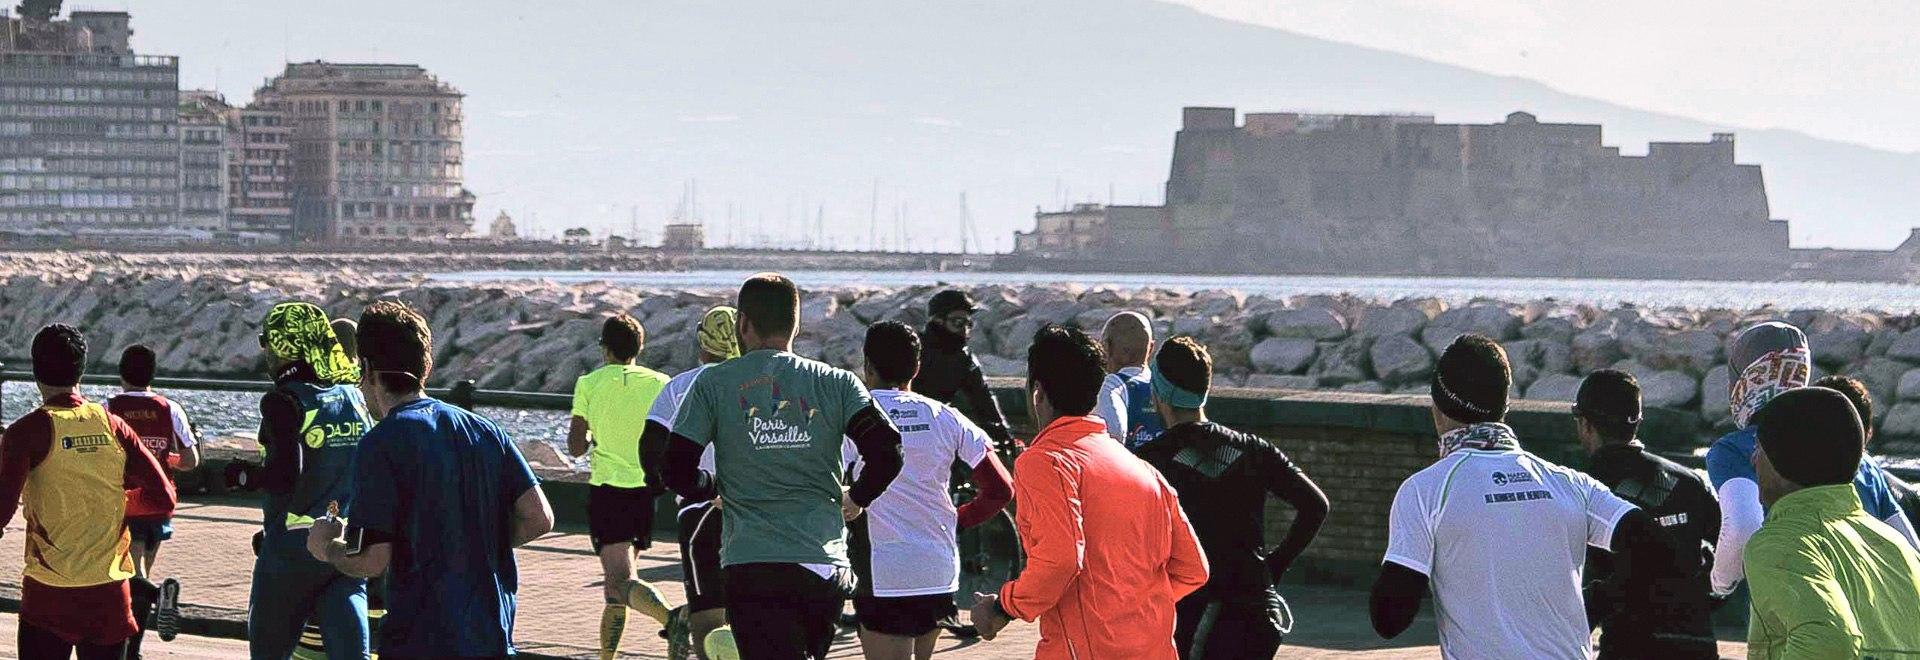 Half Marathon Napoli Highlights